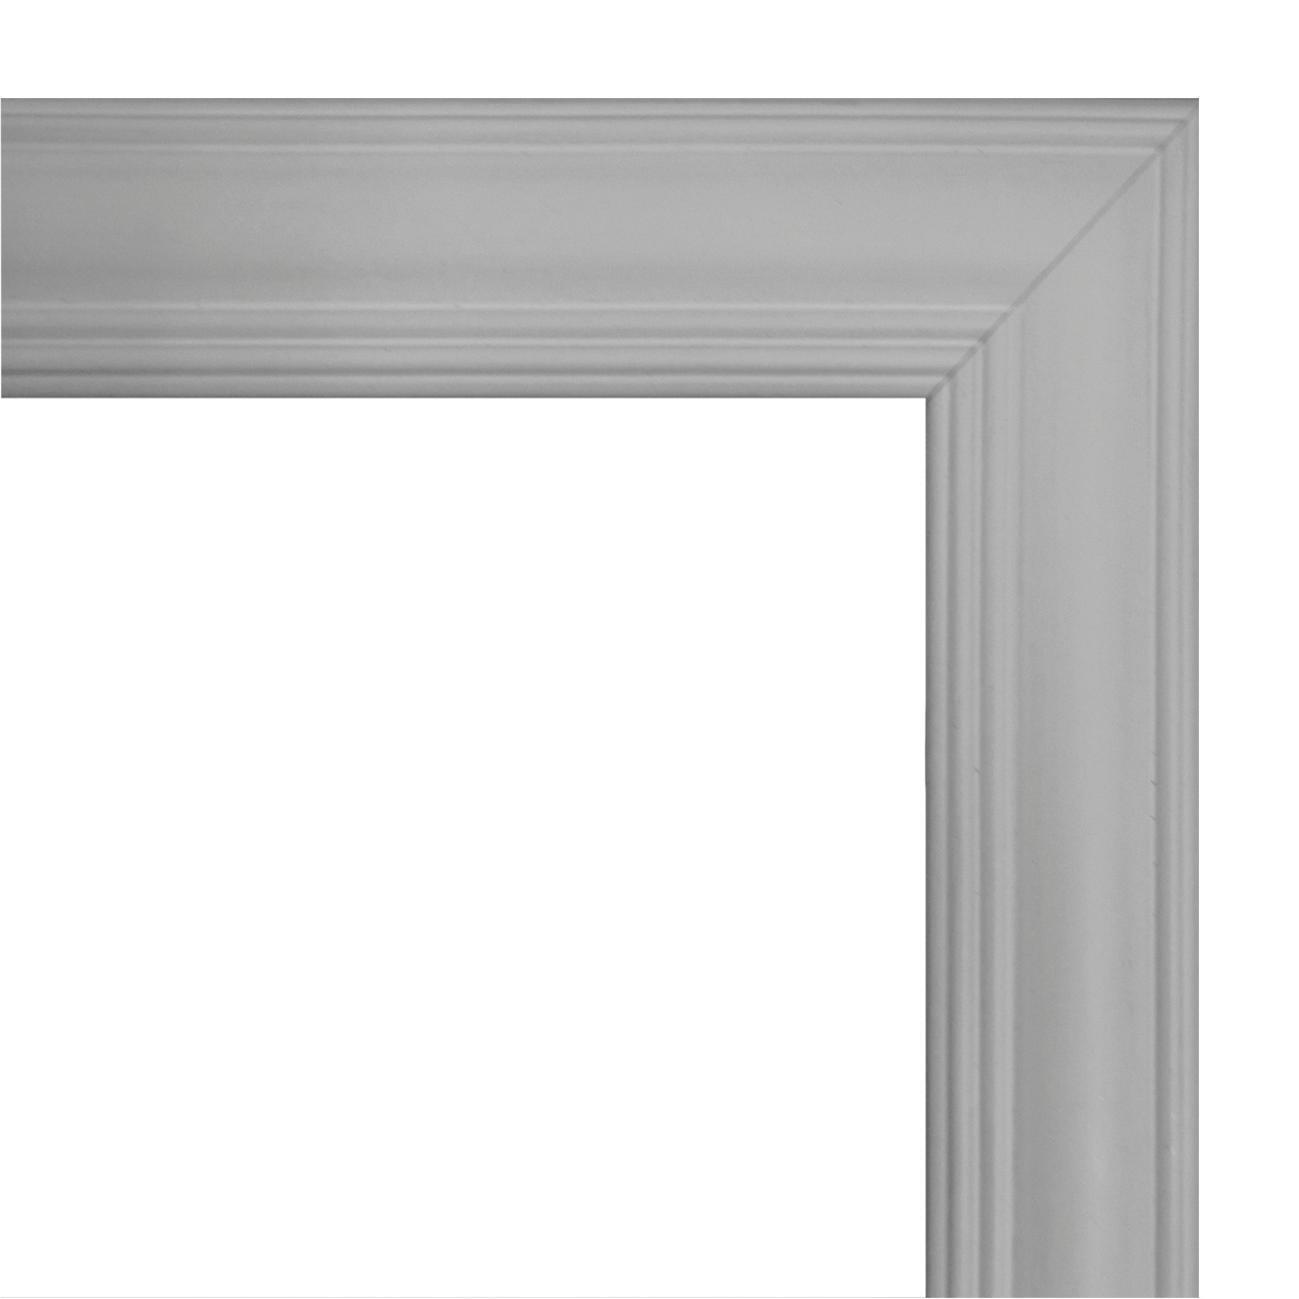 Cornice INSPIRE Louise bianco per foto da 13x18 cm - 4